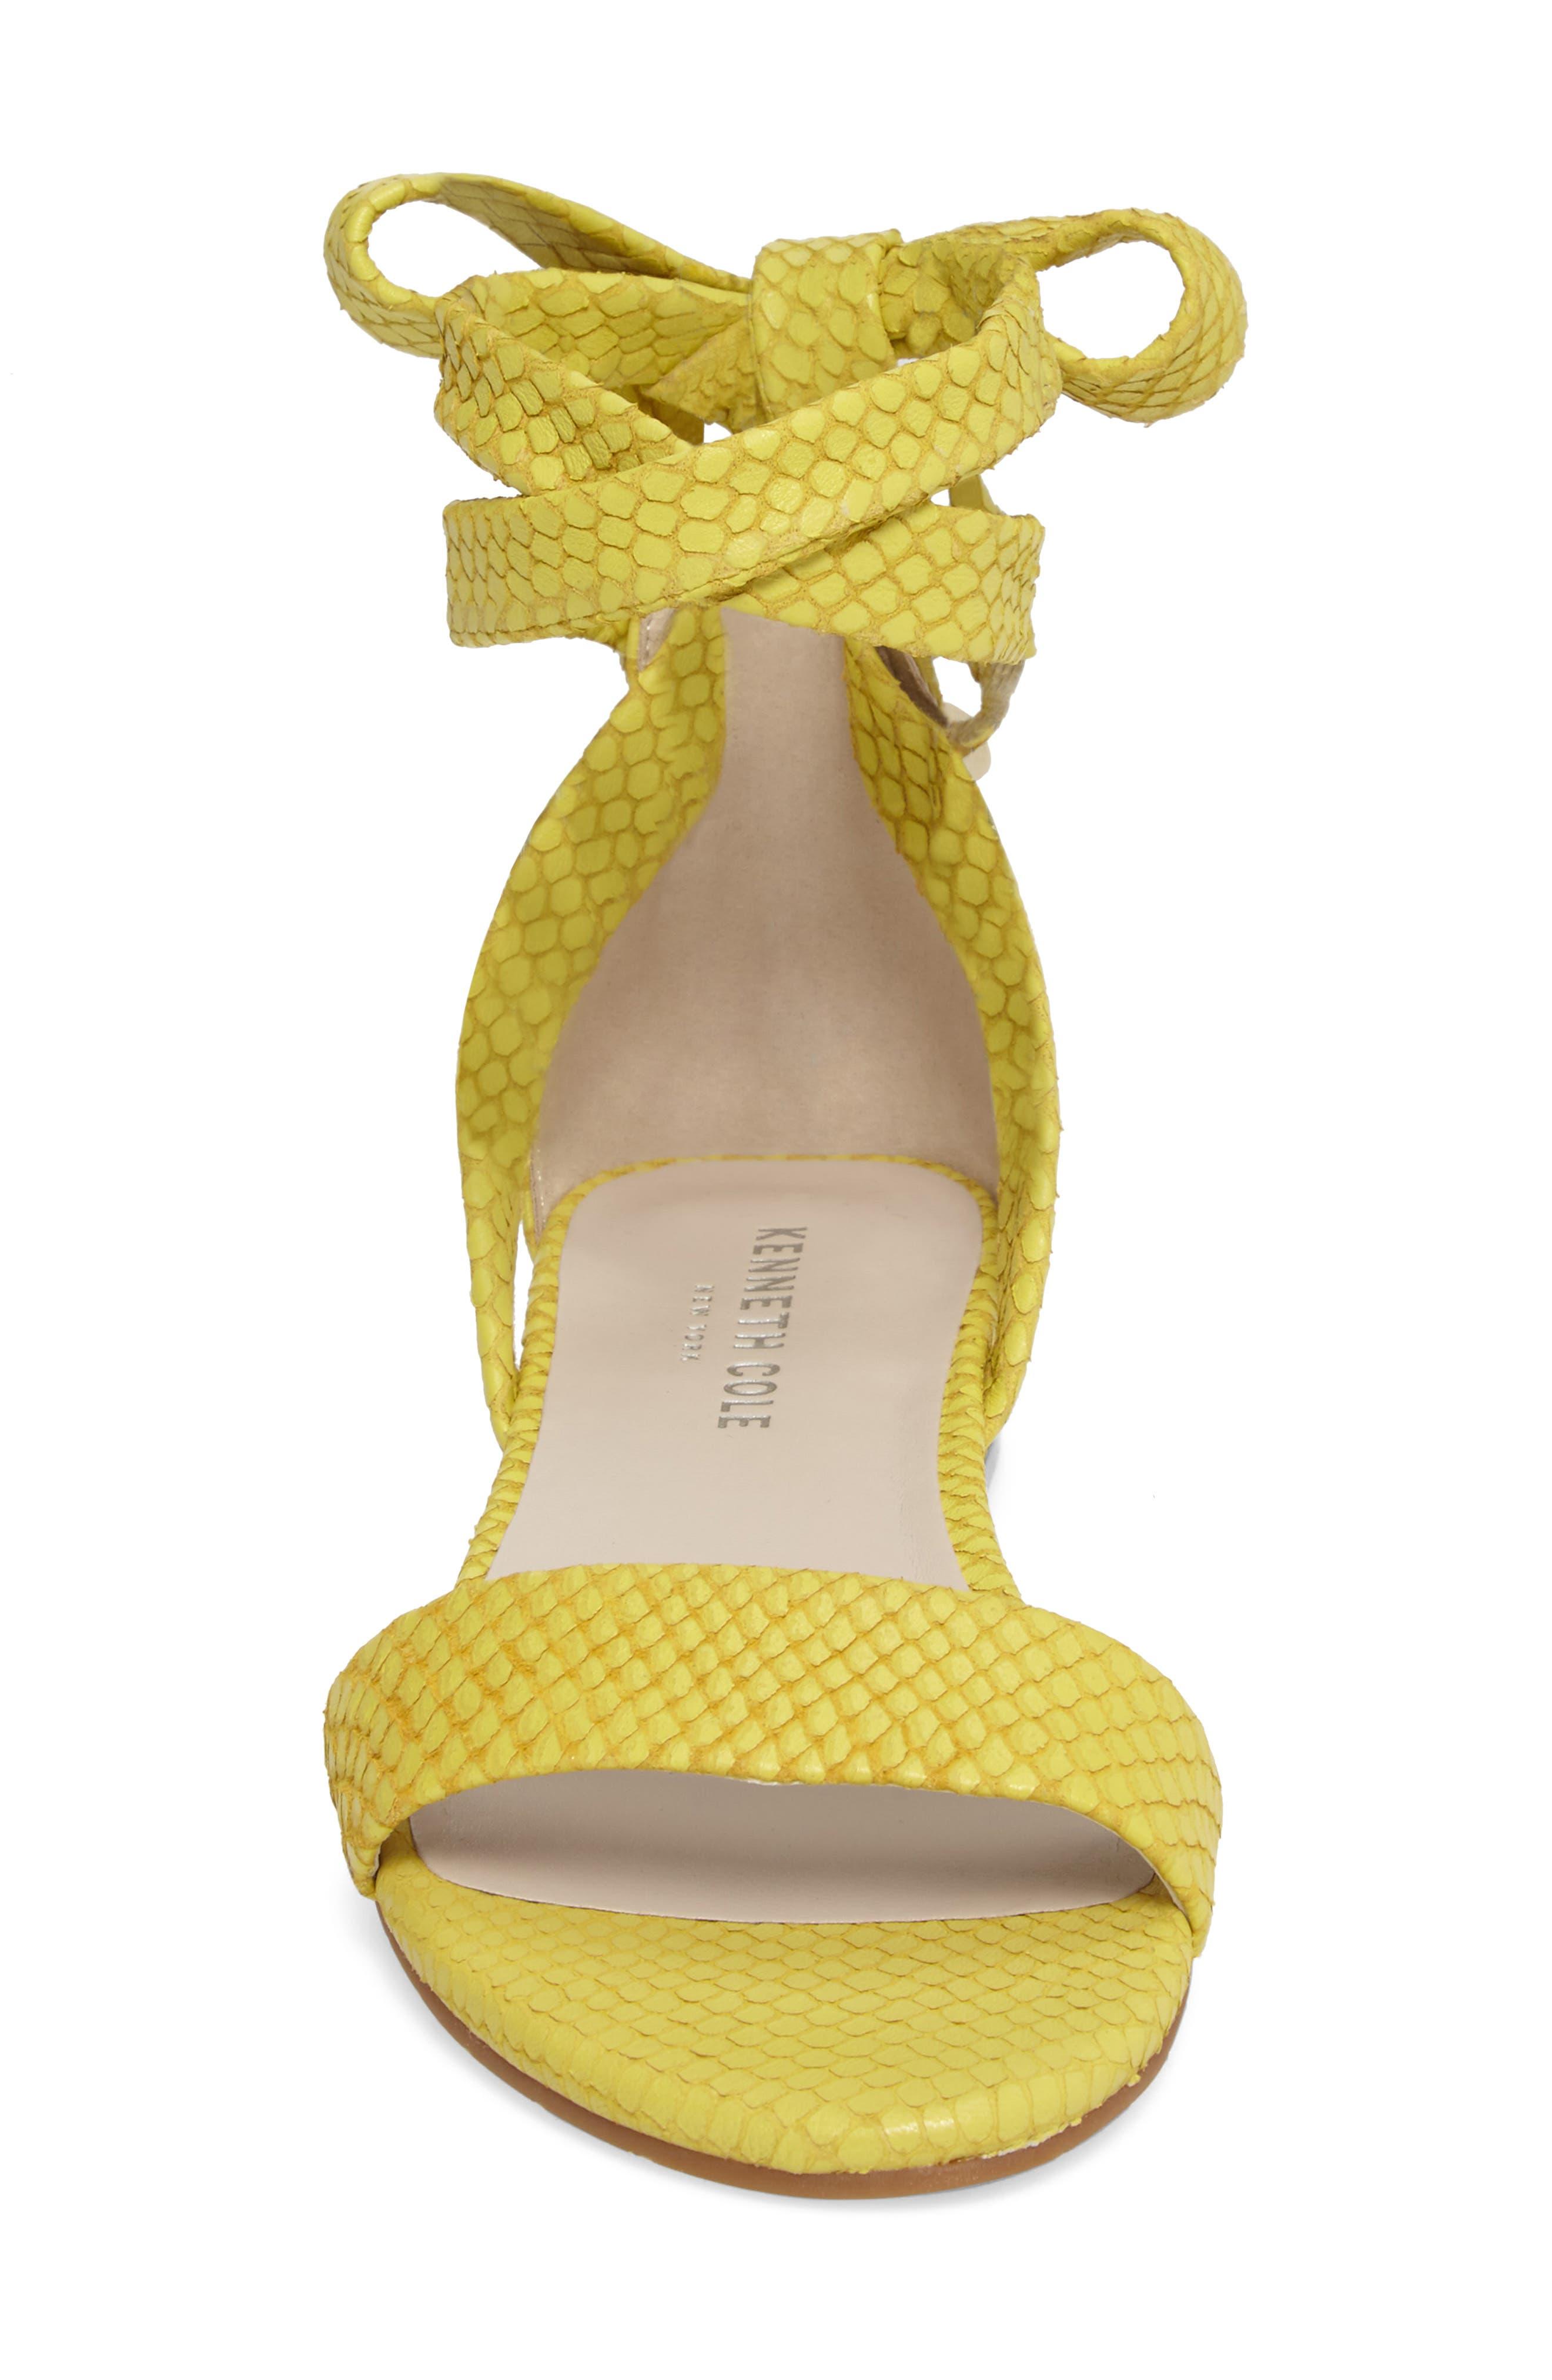 Valen Tassel Lace-Up Sandal,                             Alternate thumbnail 56, color,